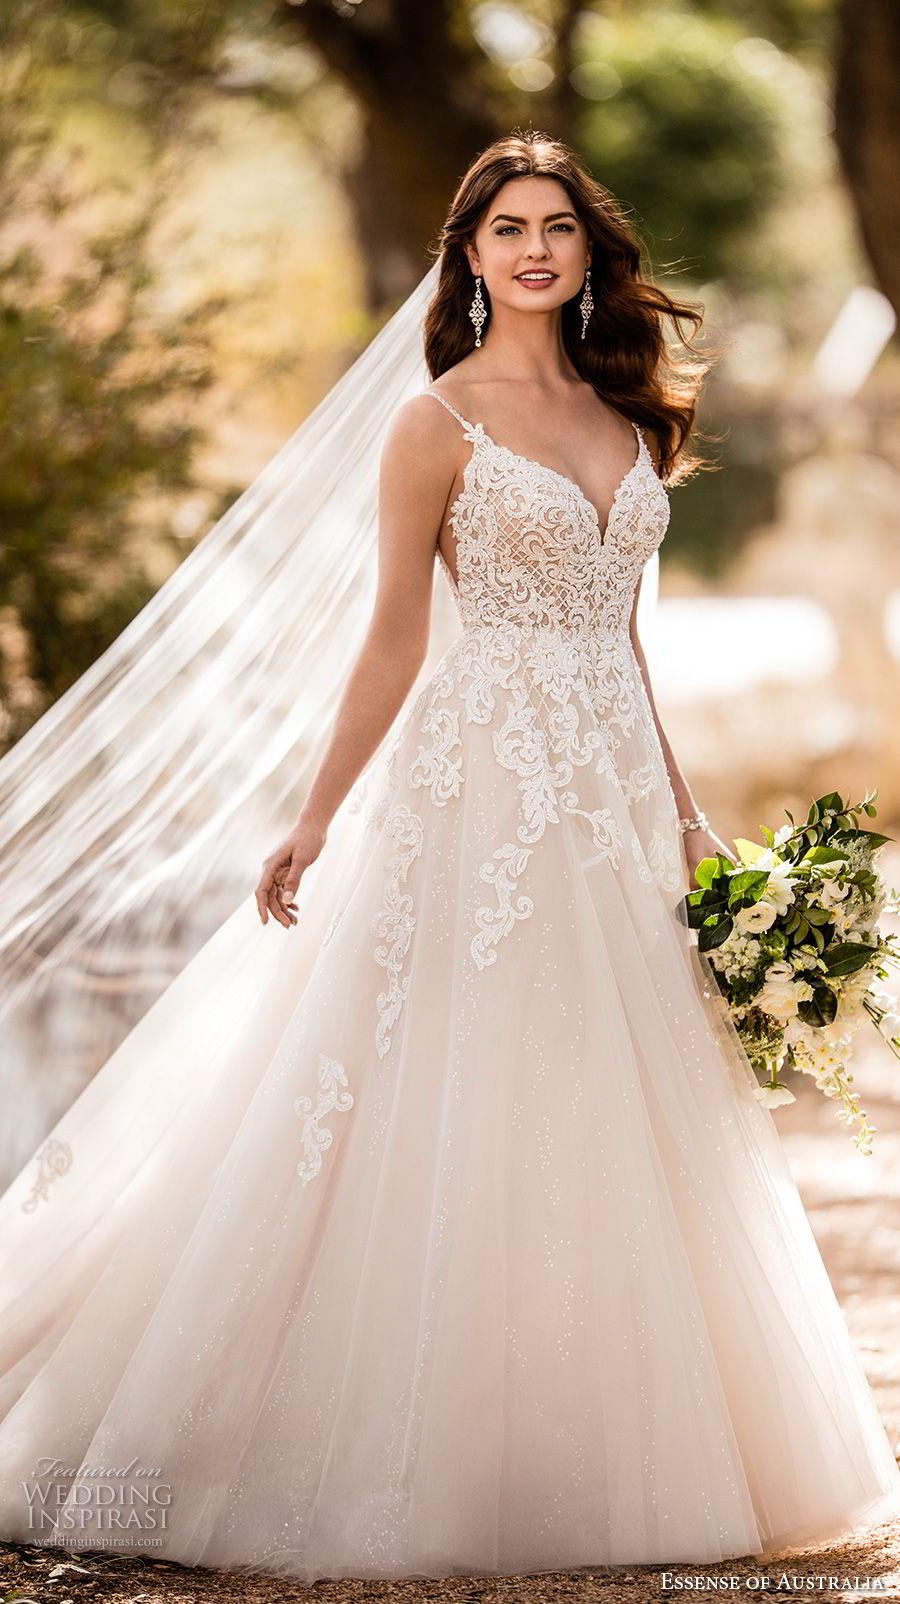 australia wedding dresses photo - 1